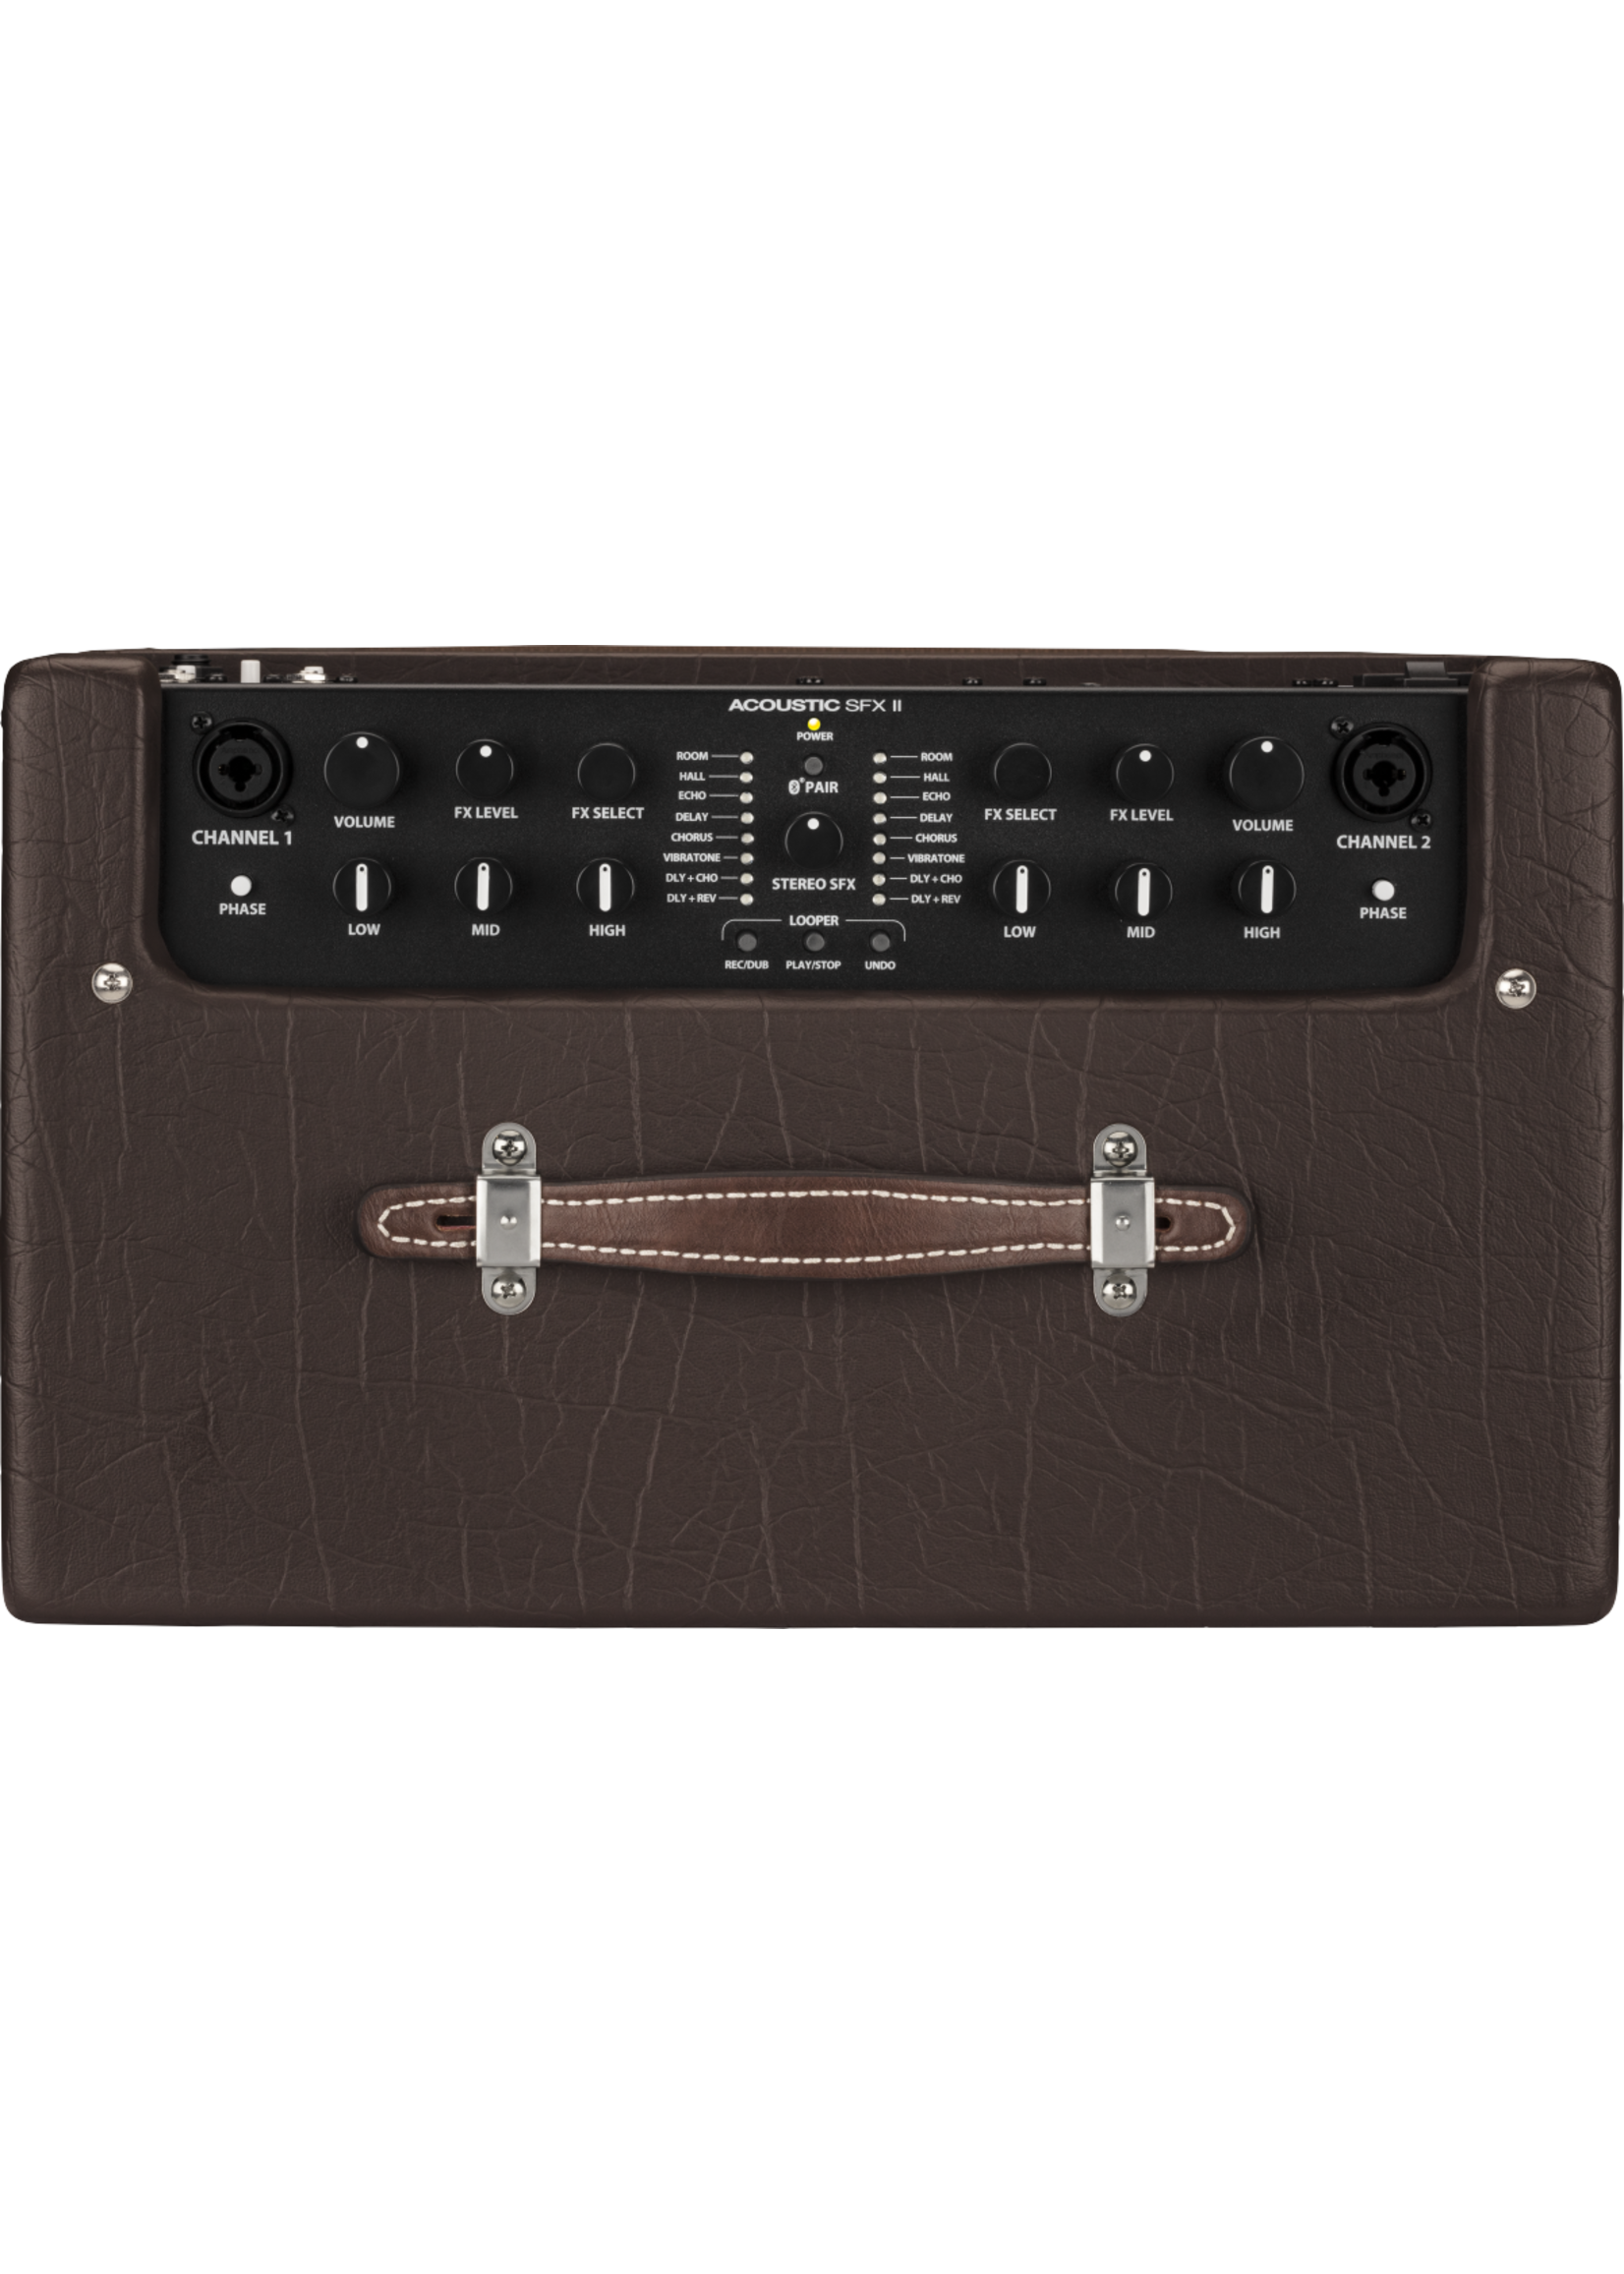 Fender Fender Acoustic SFX II Guitar Amp